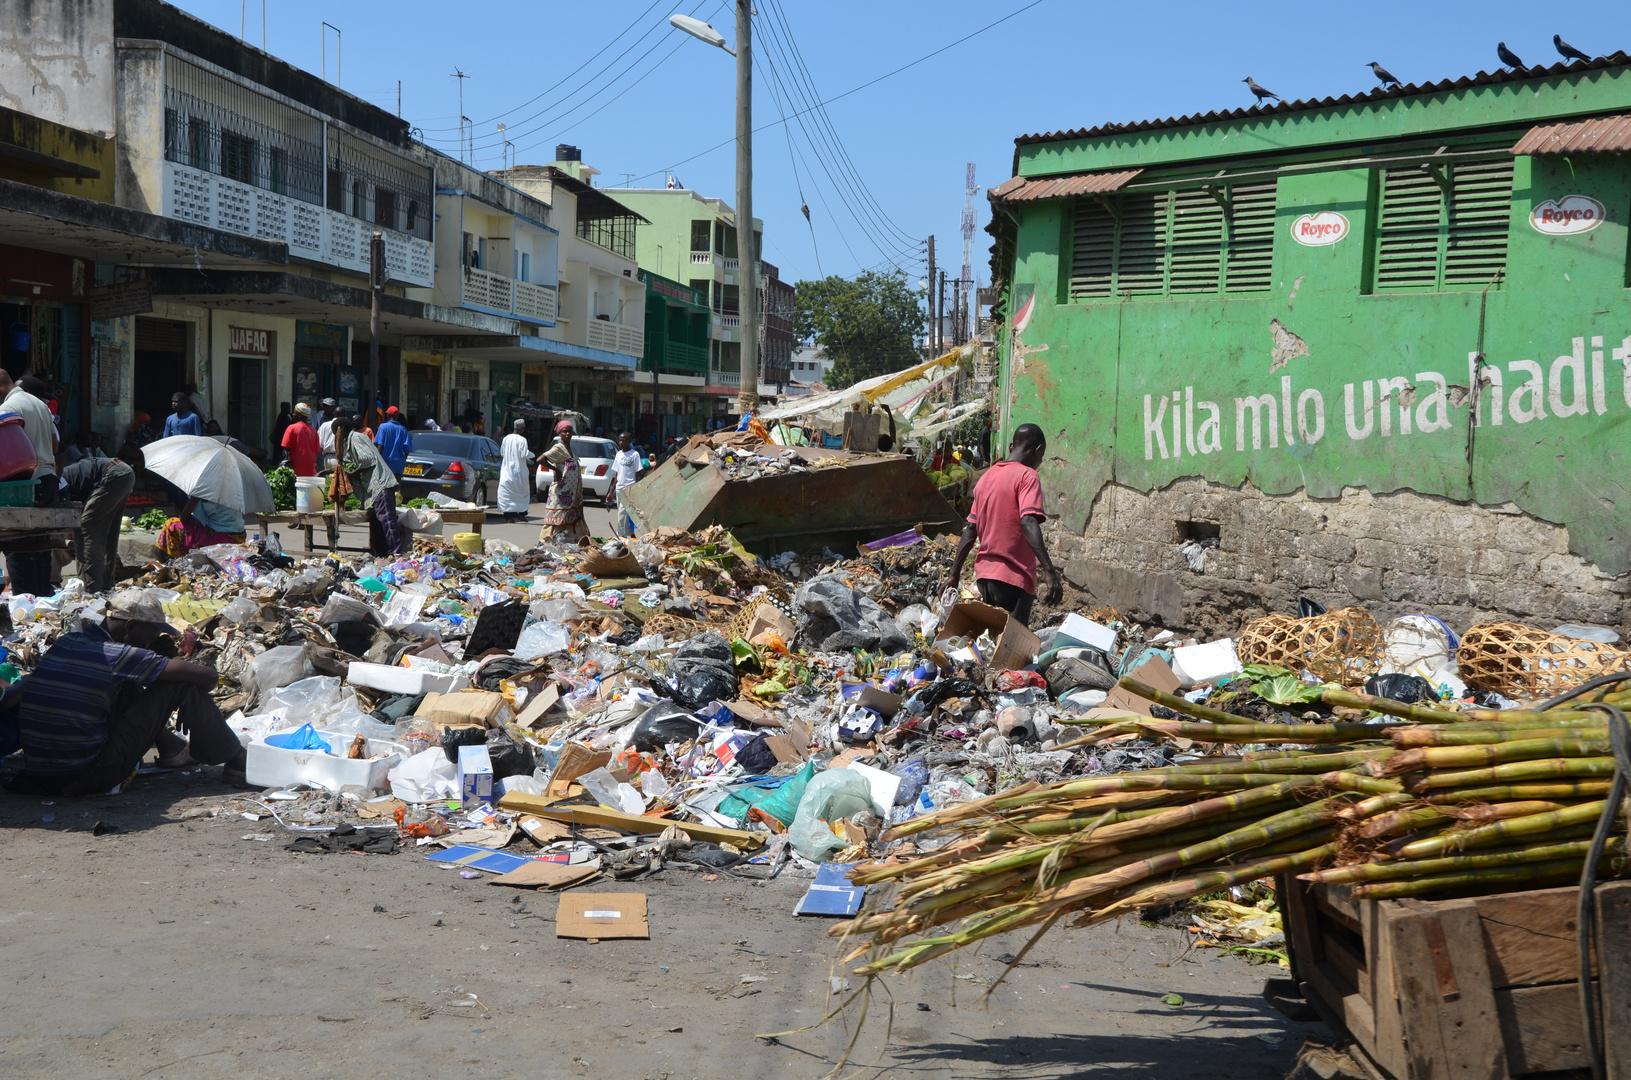 Straßenecke in Mombasa